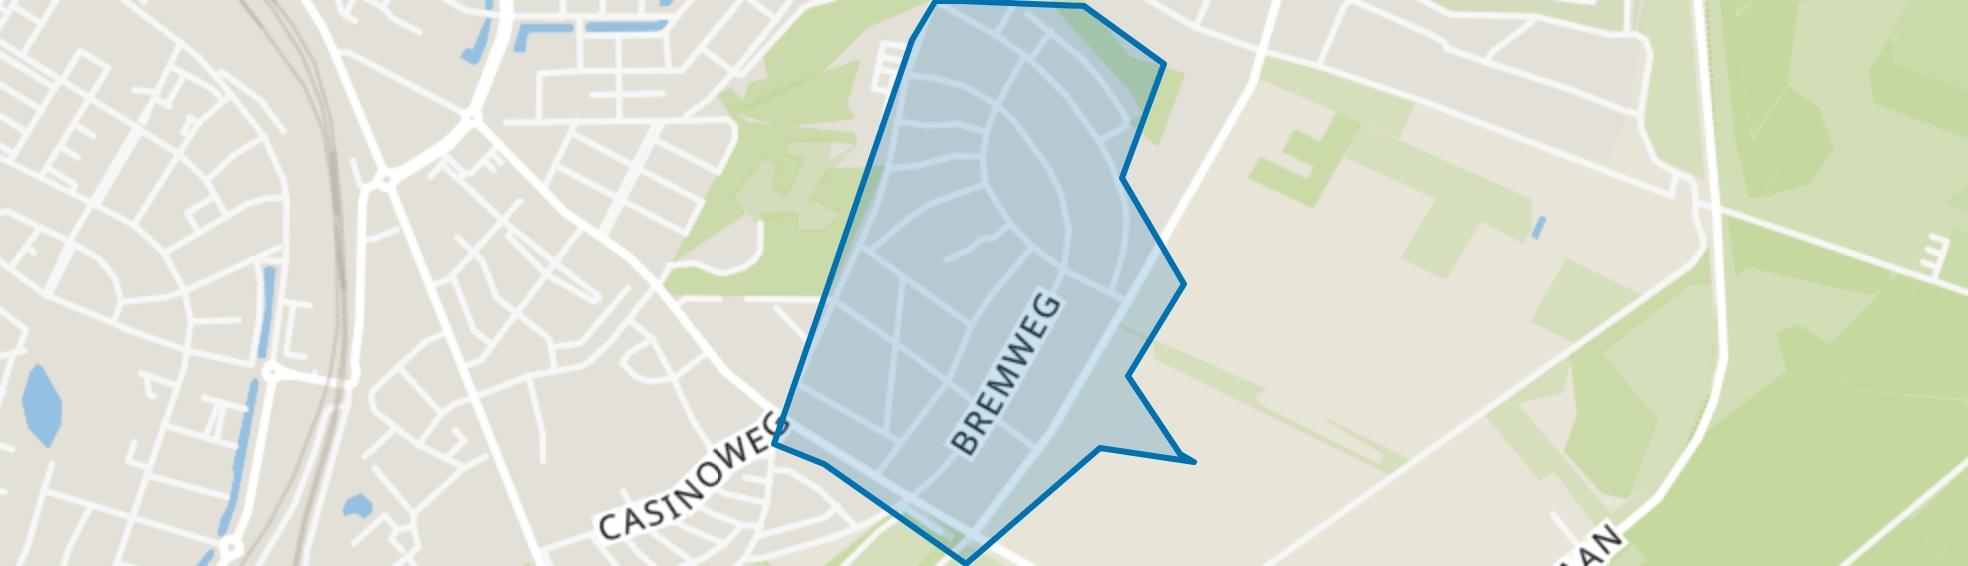 Bloemenbuurt, Venlo map